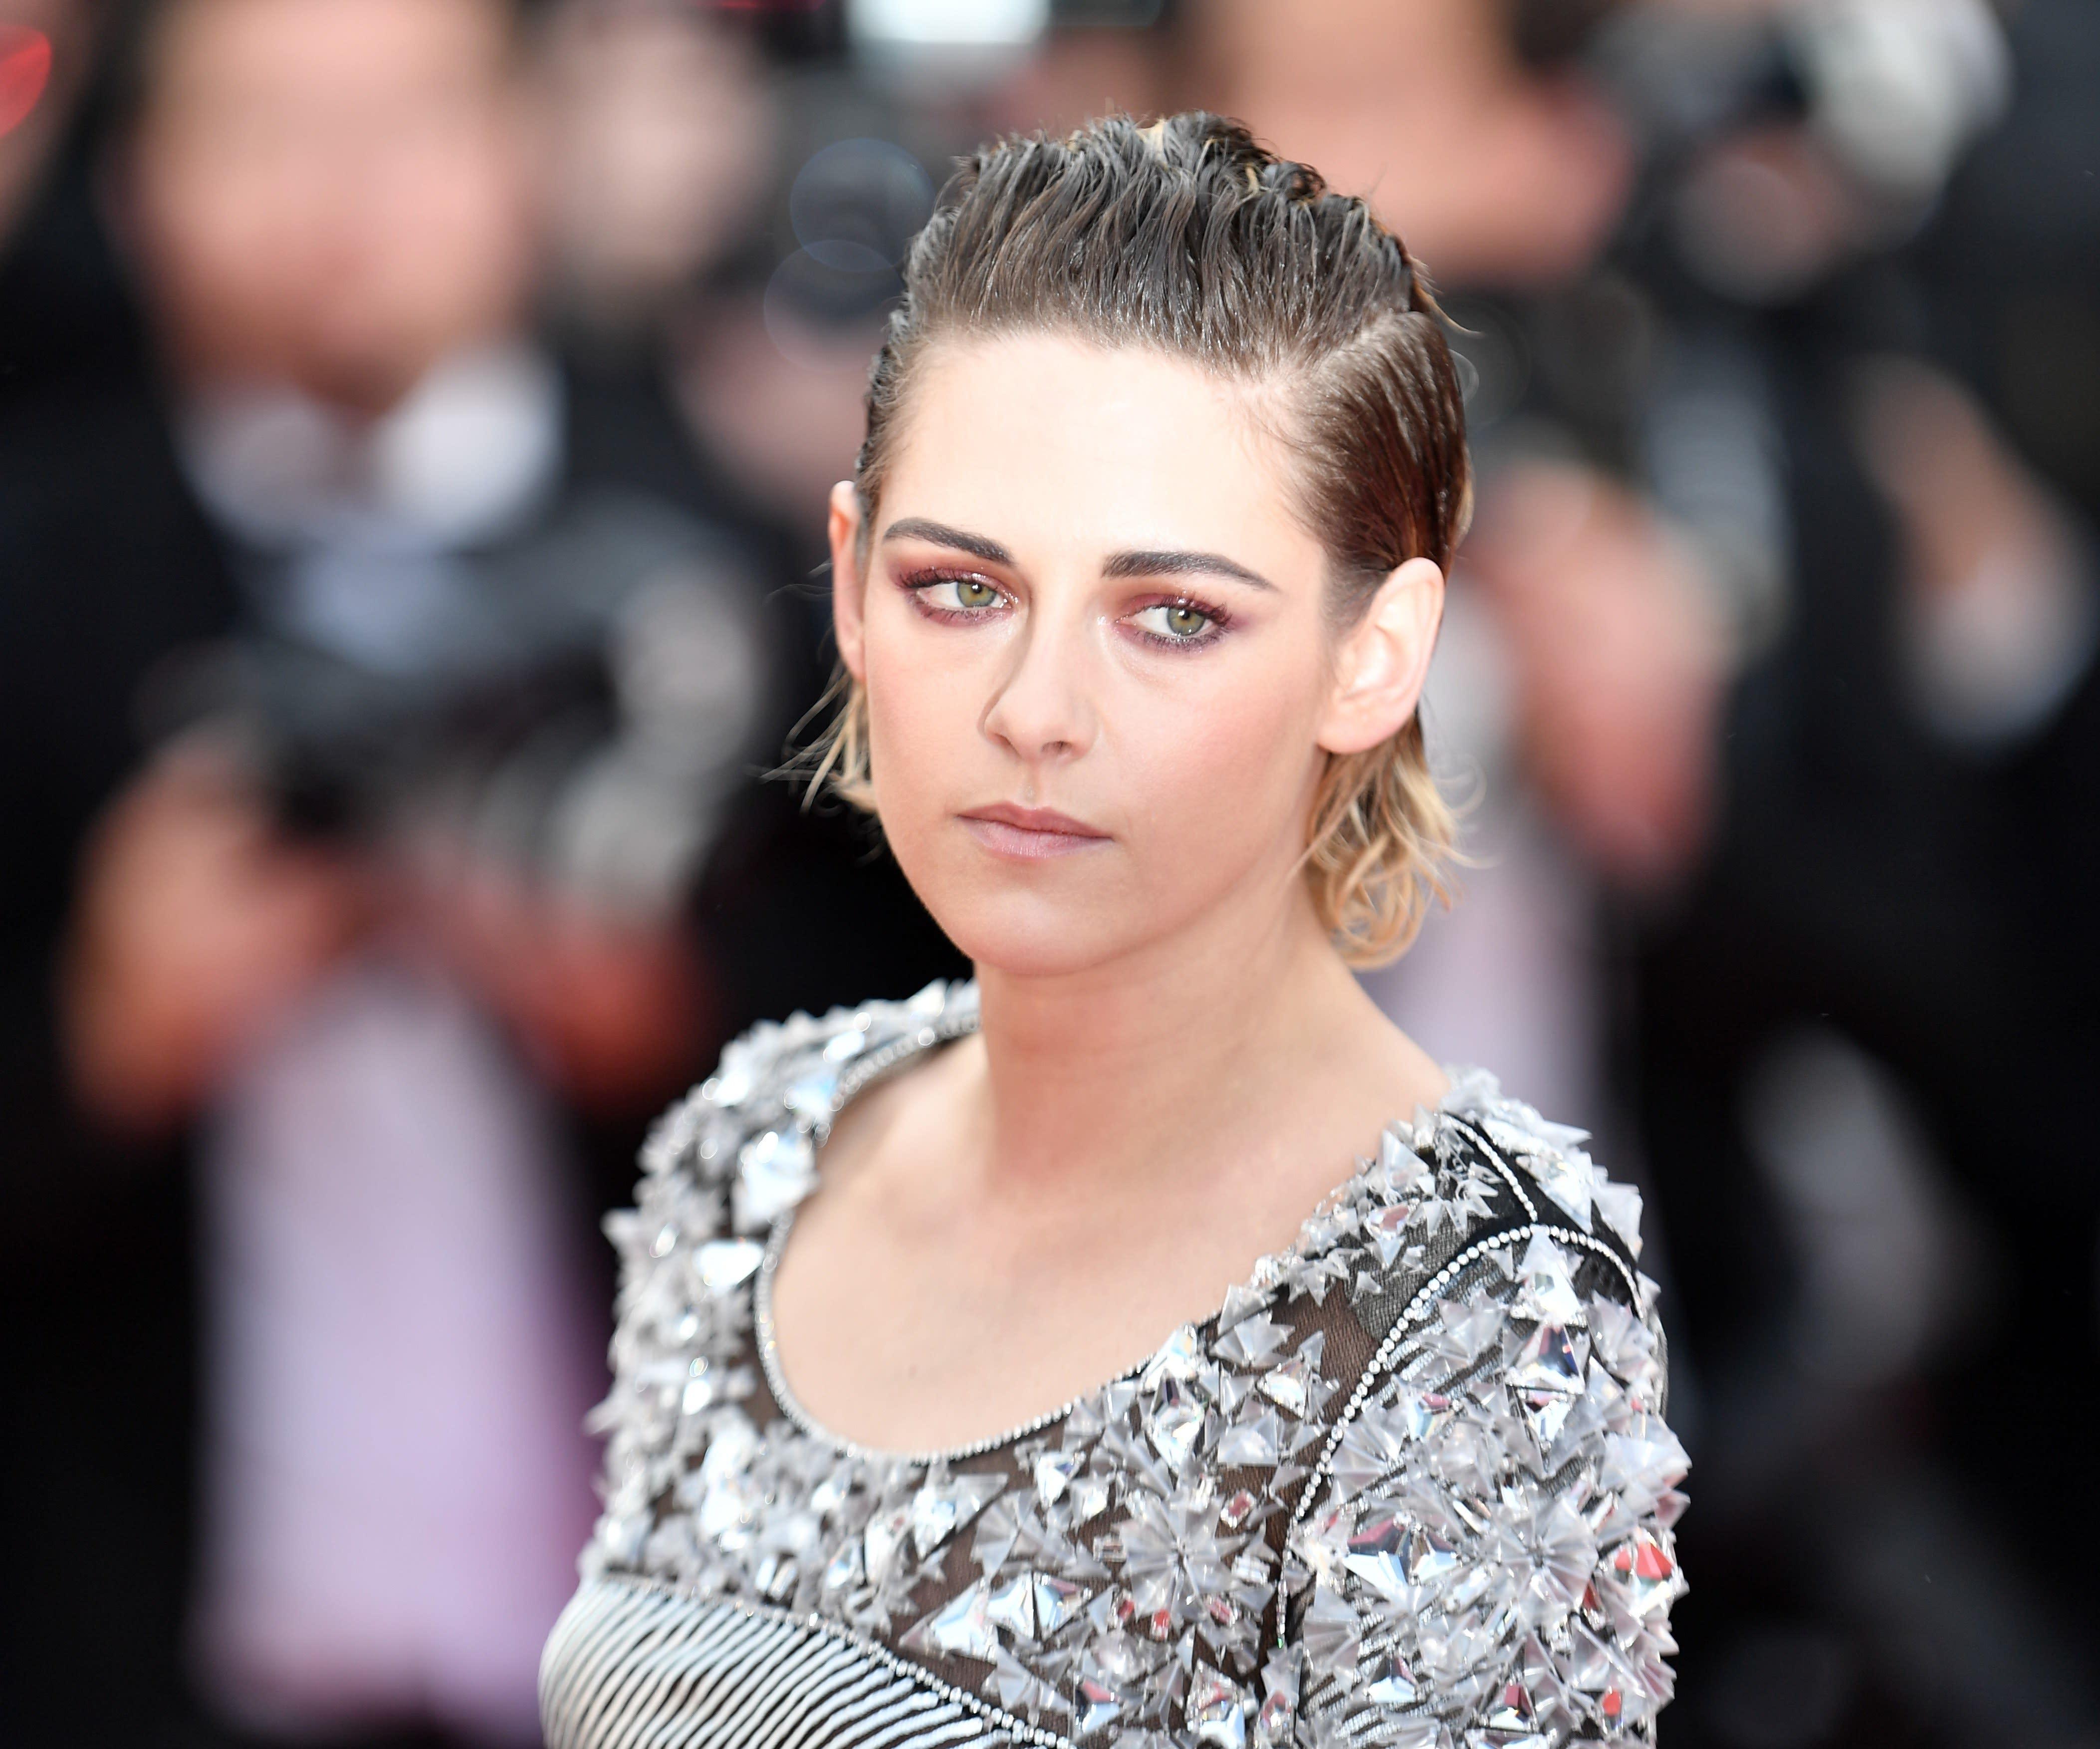 Kristen Stewart first talked about her wanderings between men and women